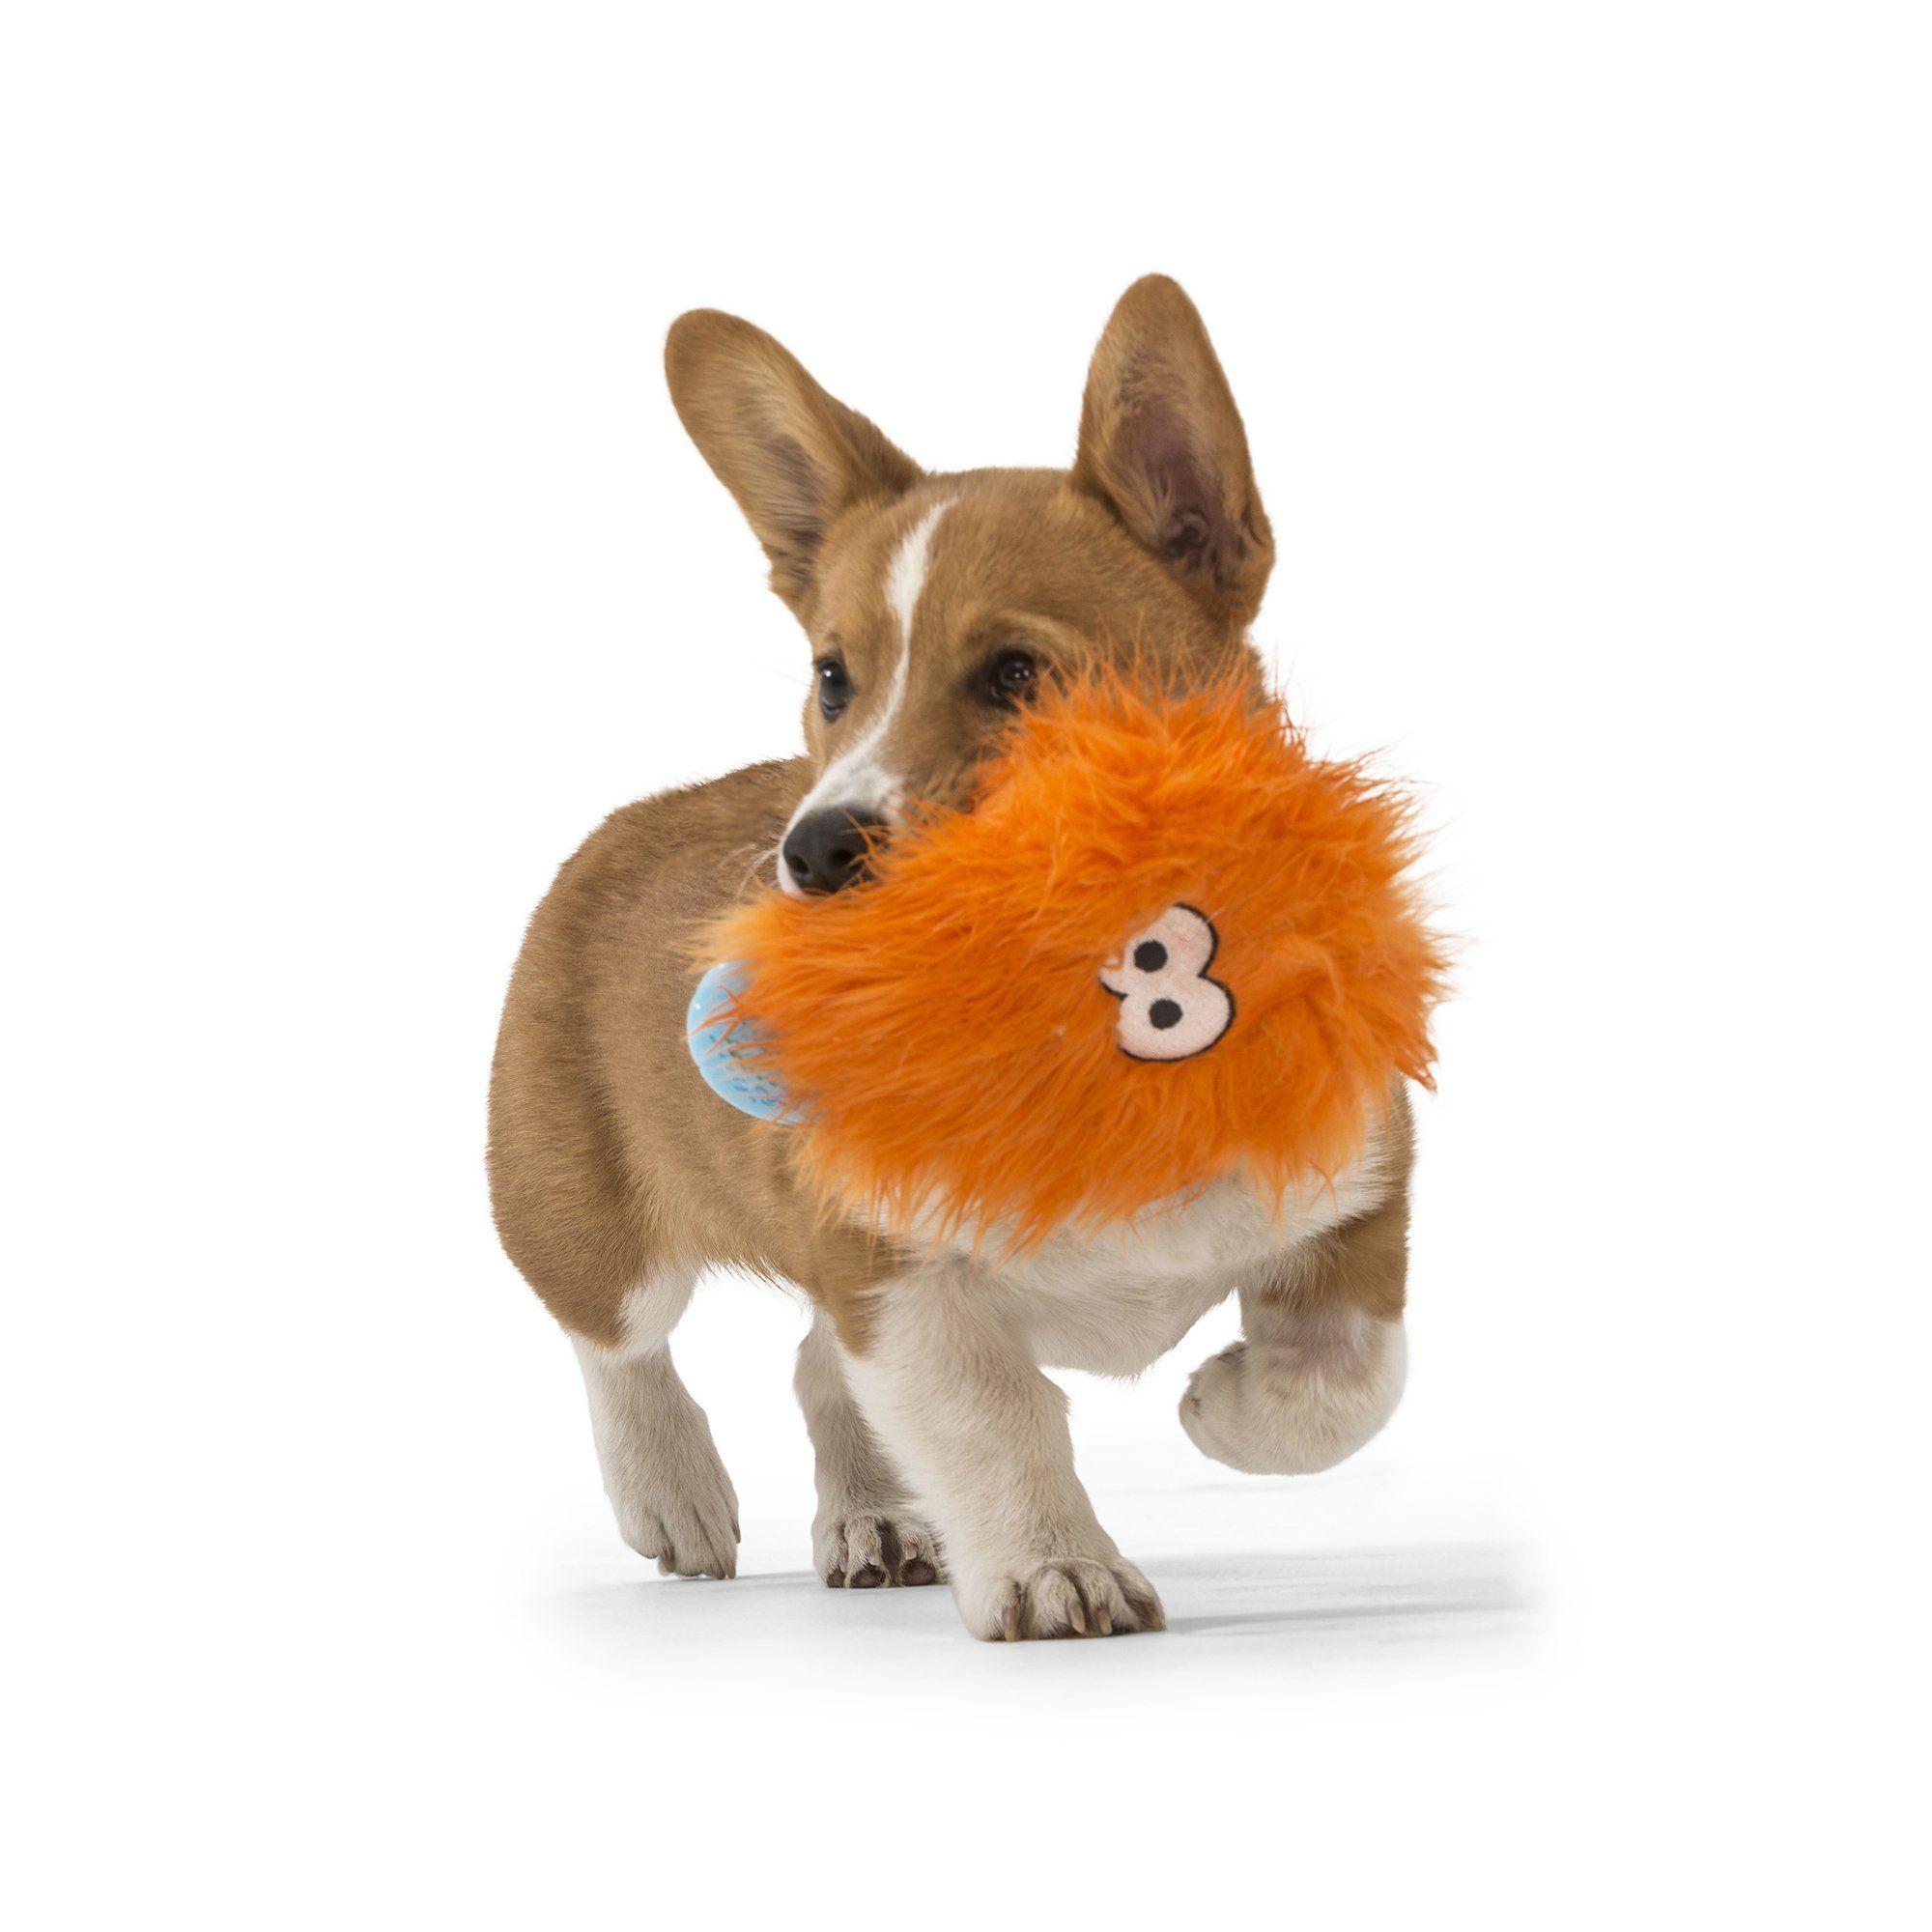 West Paw Rowdies With Hardytex And Zogoflex Durable Plush Dog Toy